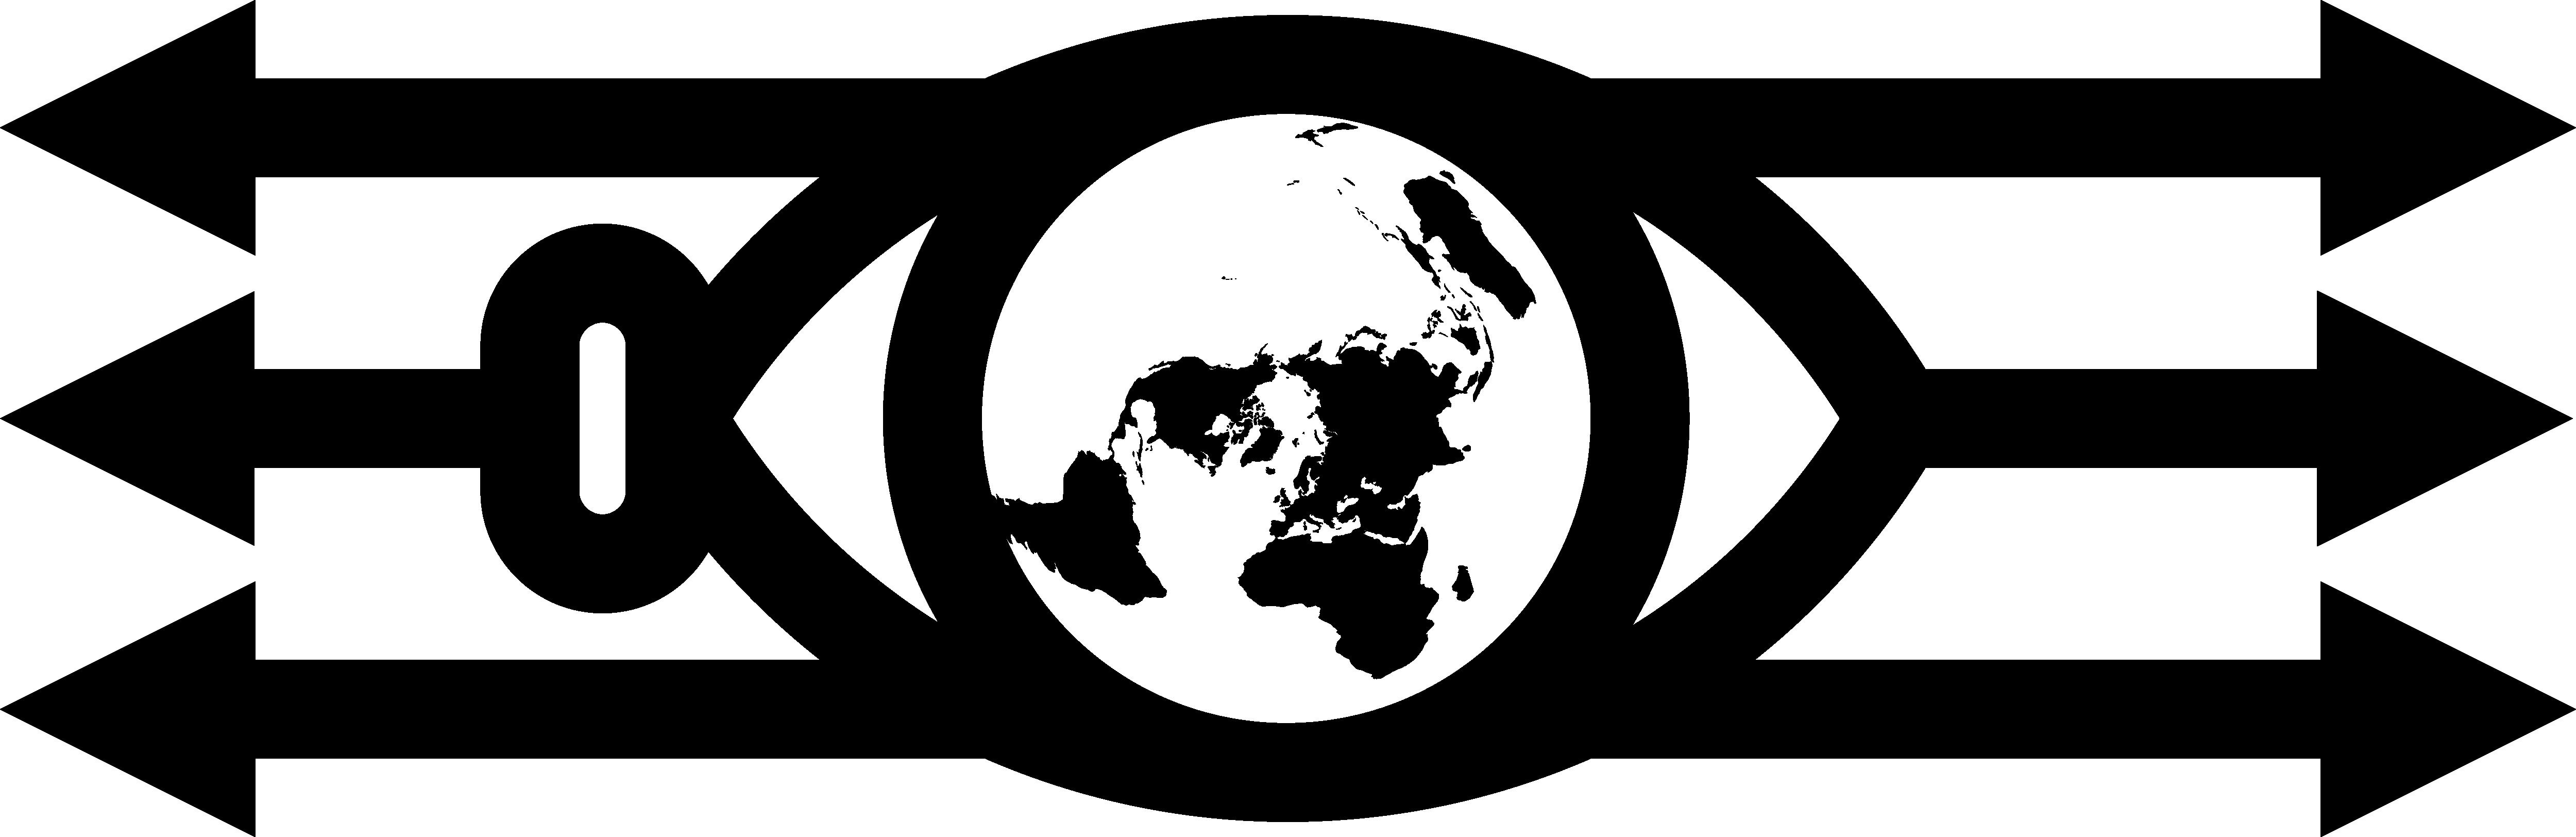 ci_logo_1.png